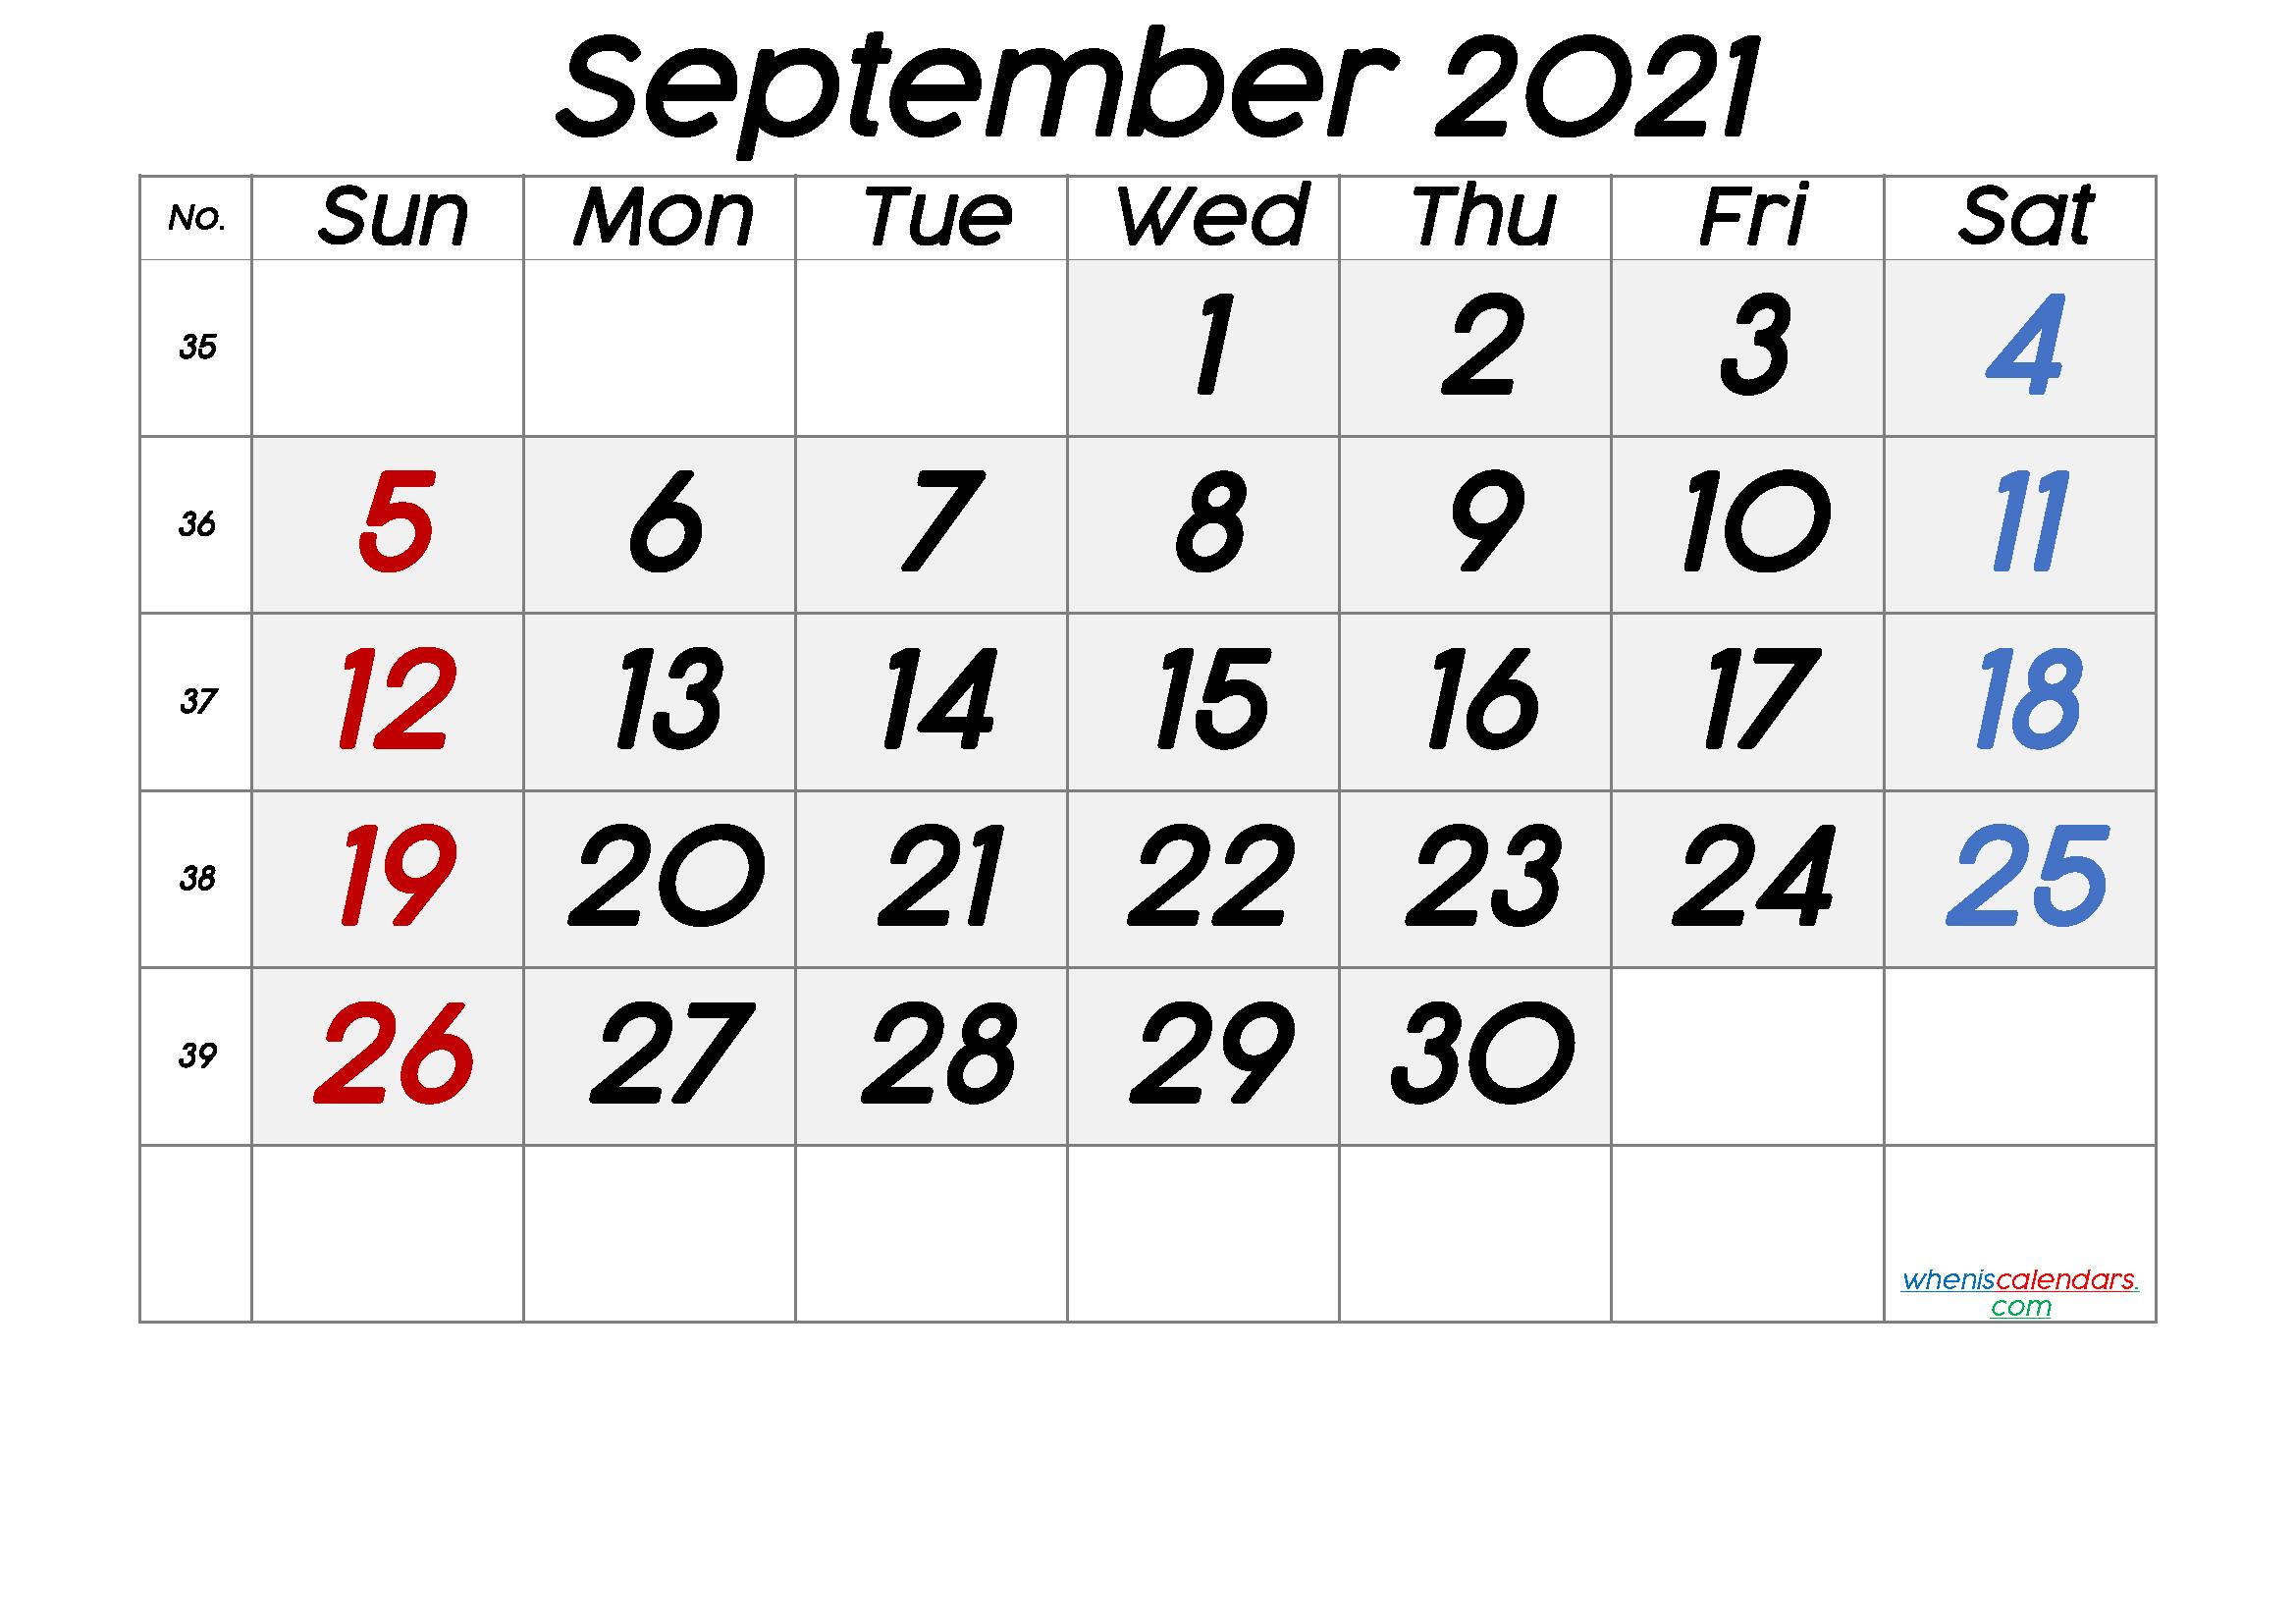 Free Printable September 2021 Calendar Premium In 2020 June Calendar Printable Calendar With Week Numbers Printable Calendar July